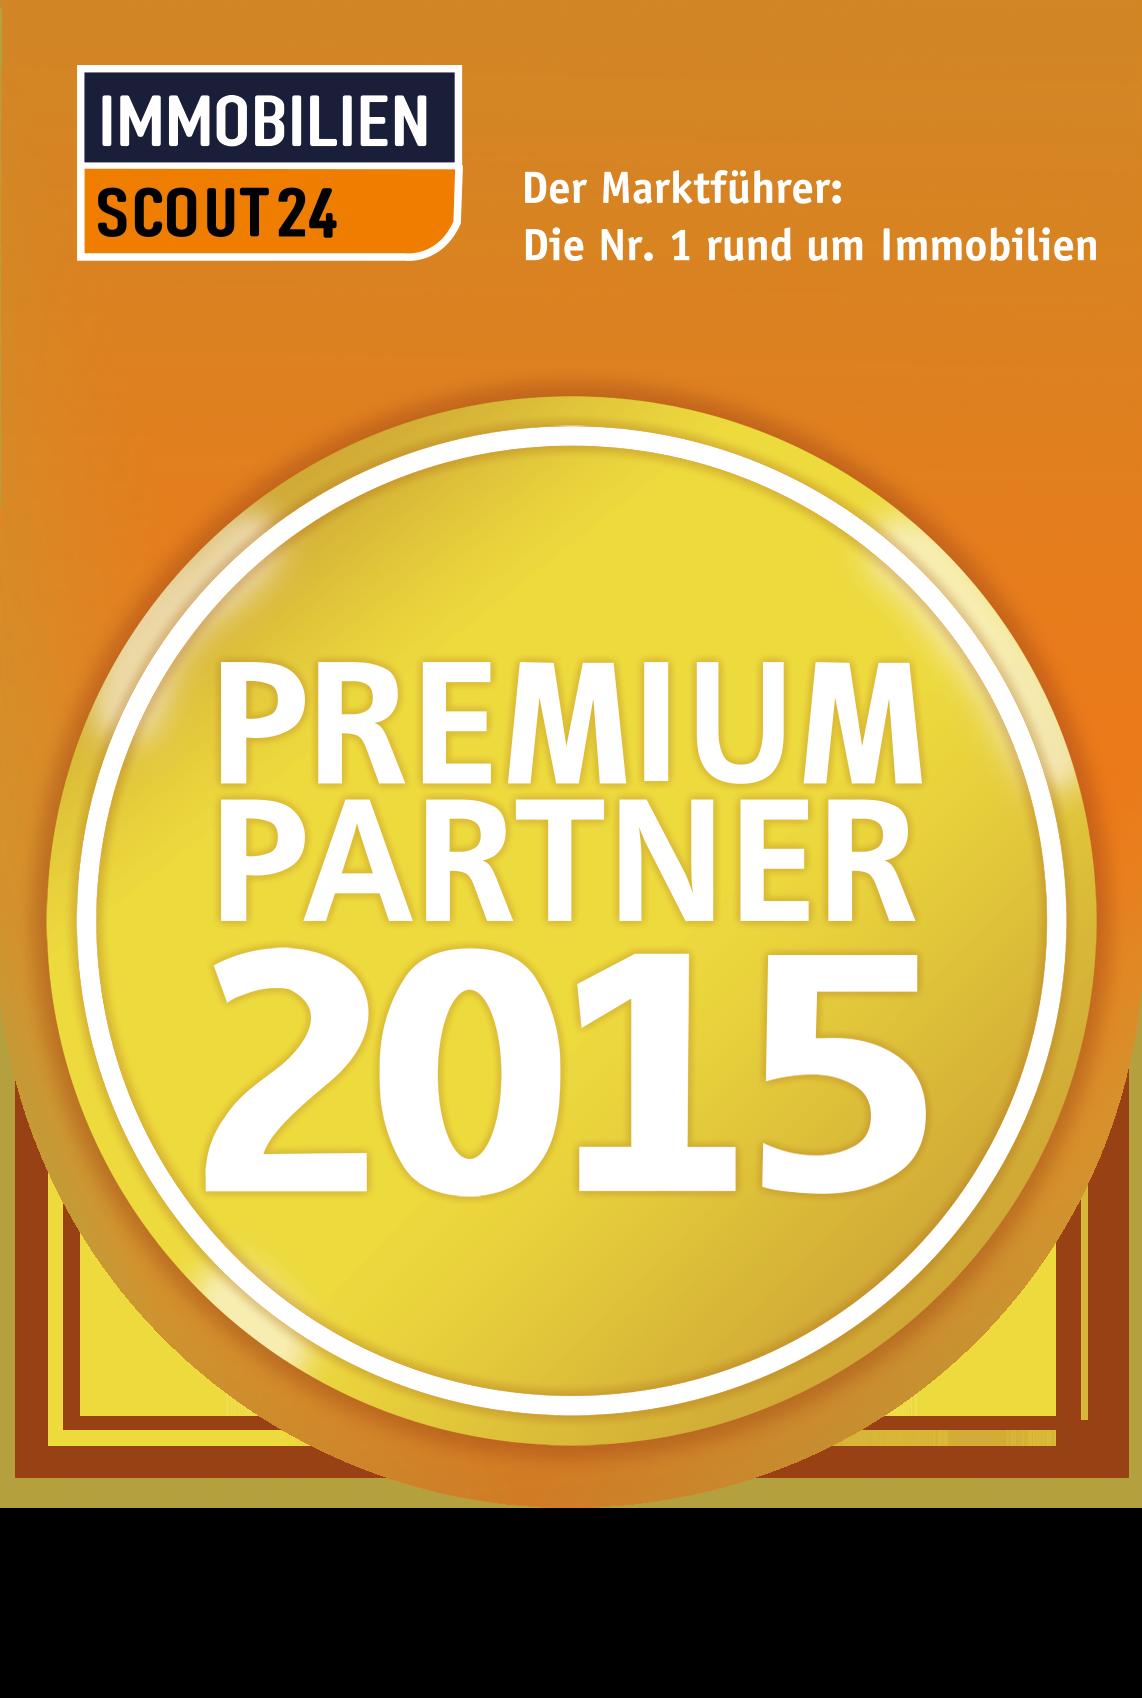 ImmobilienScout24 Premium Partner 2015